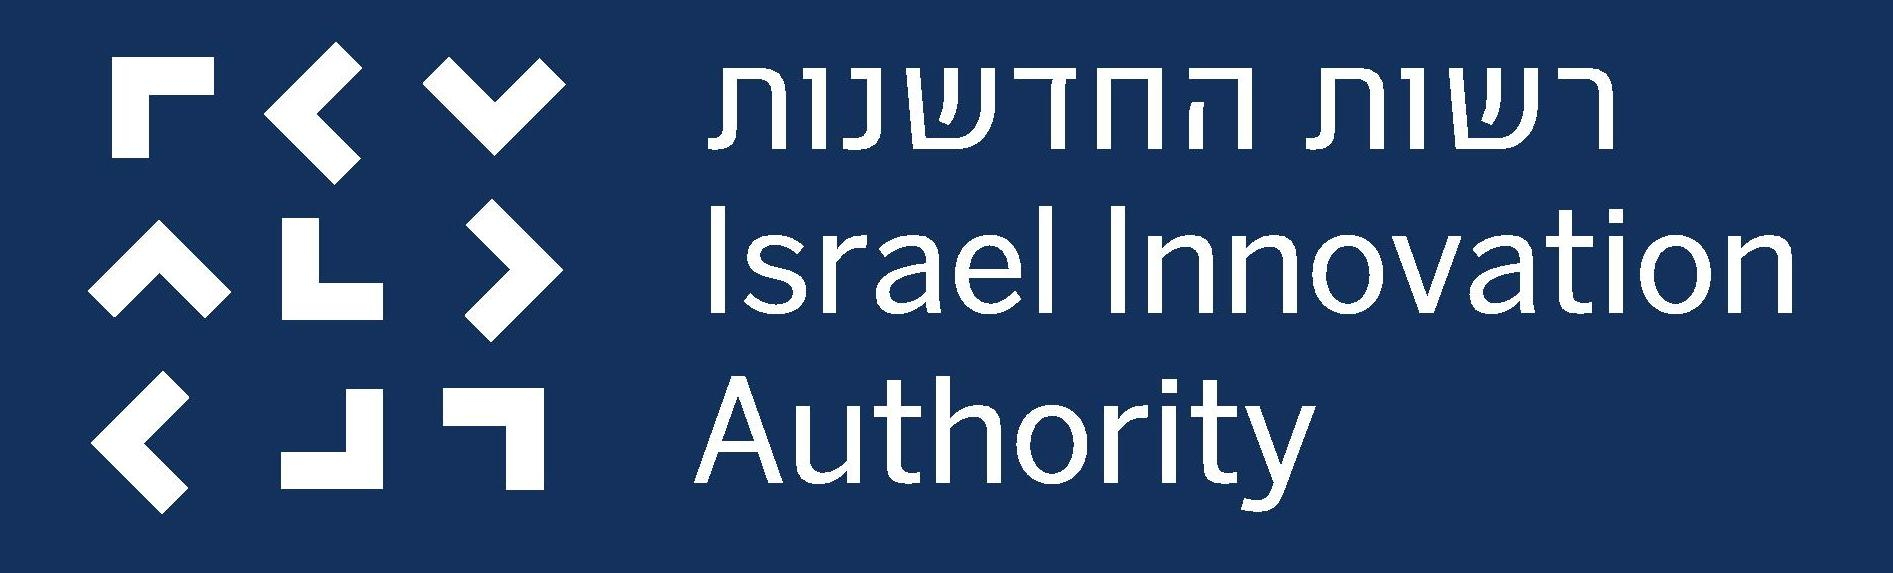 Innovation-Authority-logo-blue